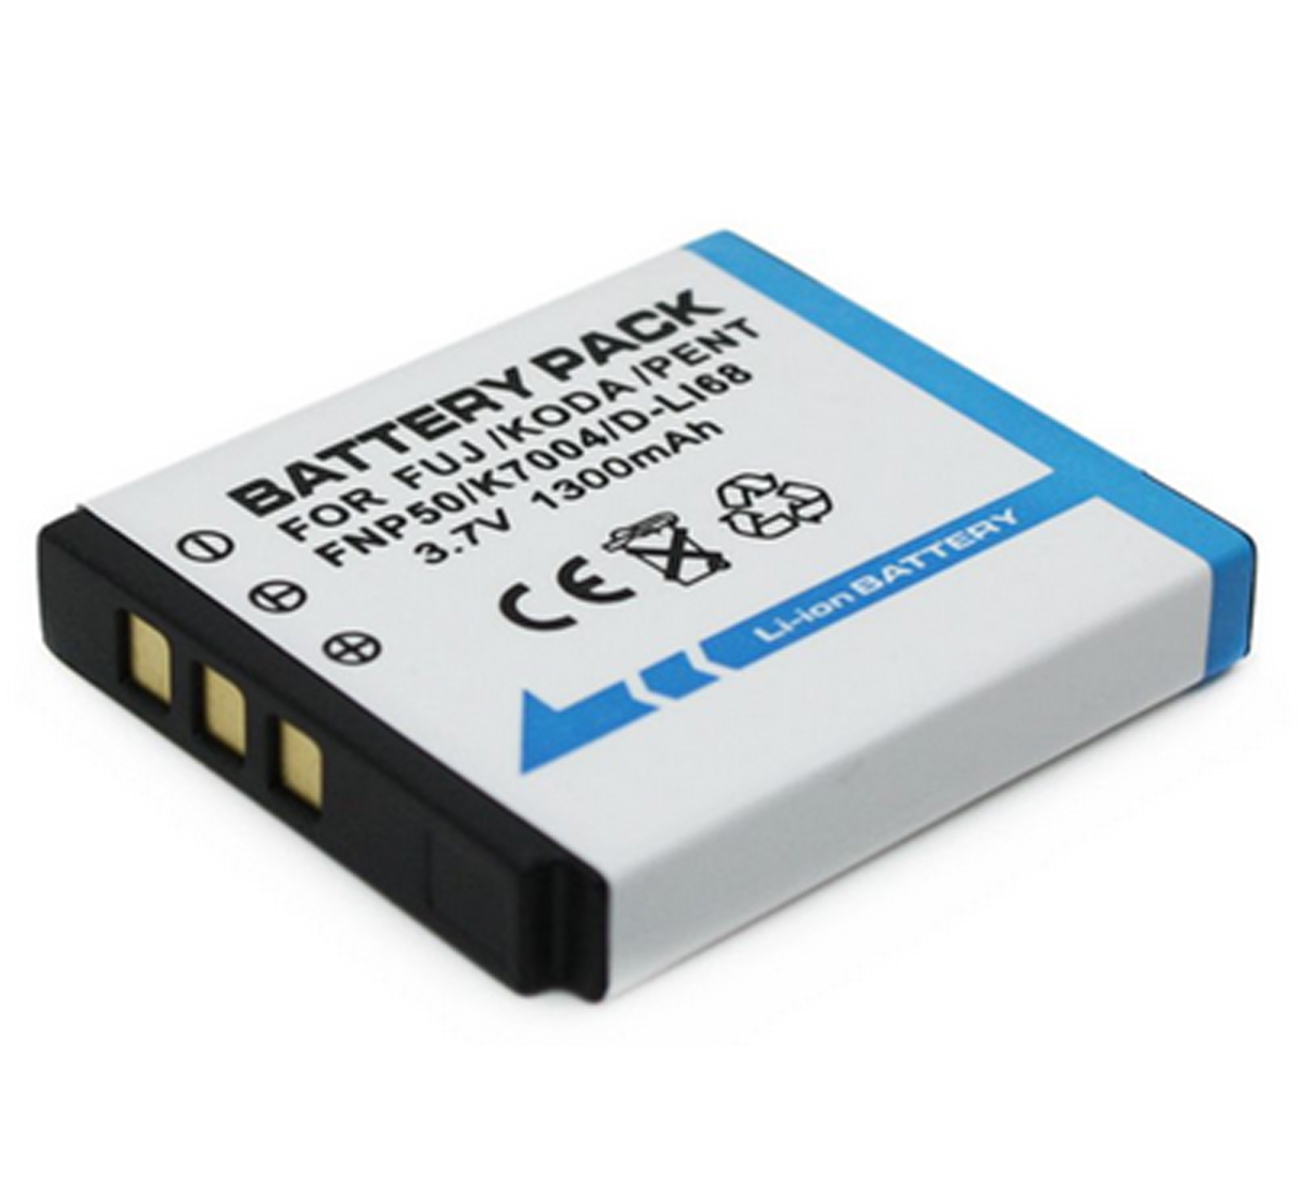 Аккумулятор для цифровой камеры Kodak Easyshare M1033, M1093 is, M1093is, M2008,V1073, V1233, V1253, V1273